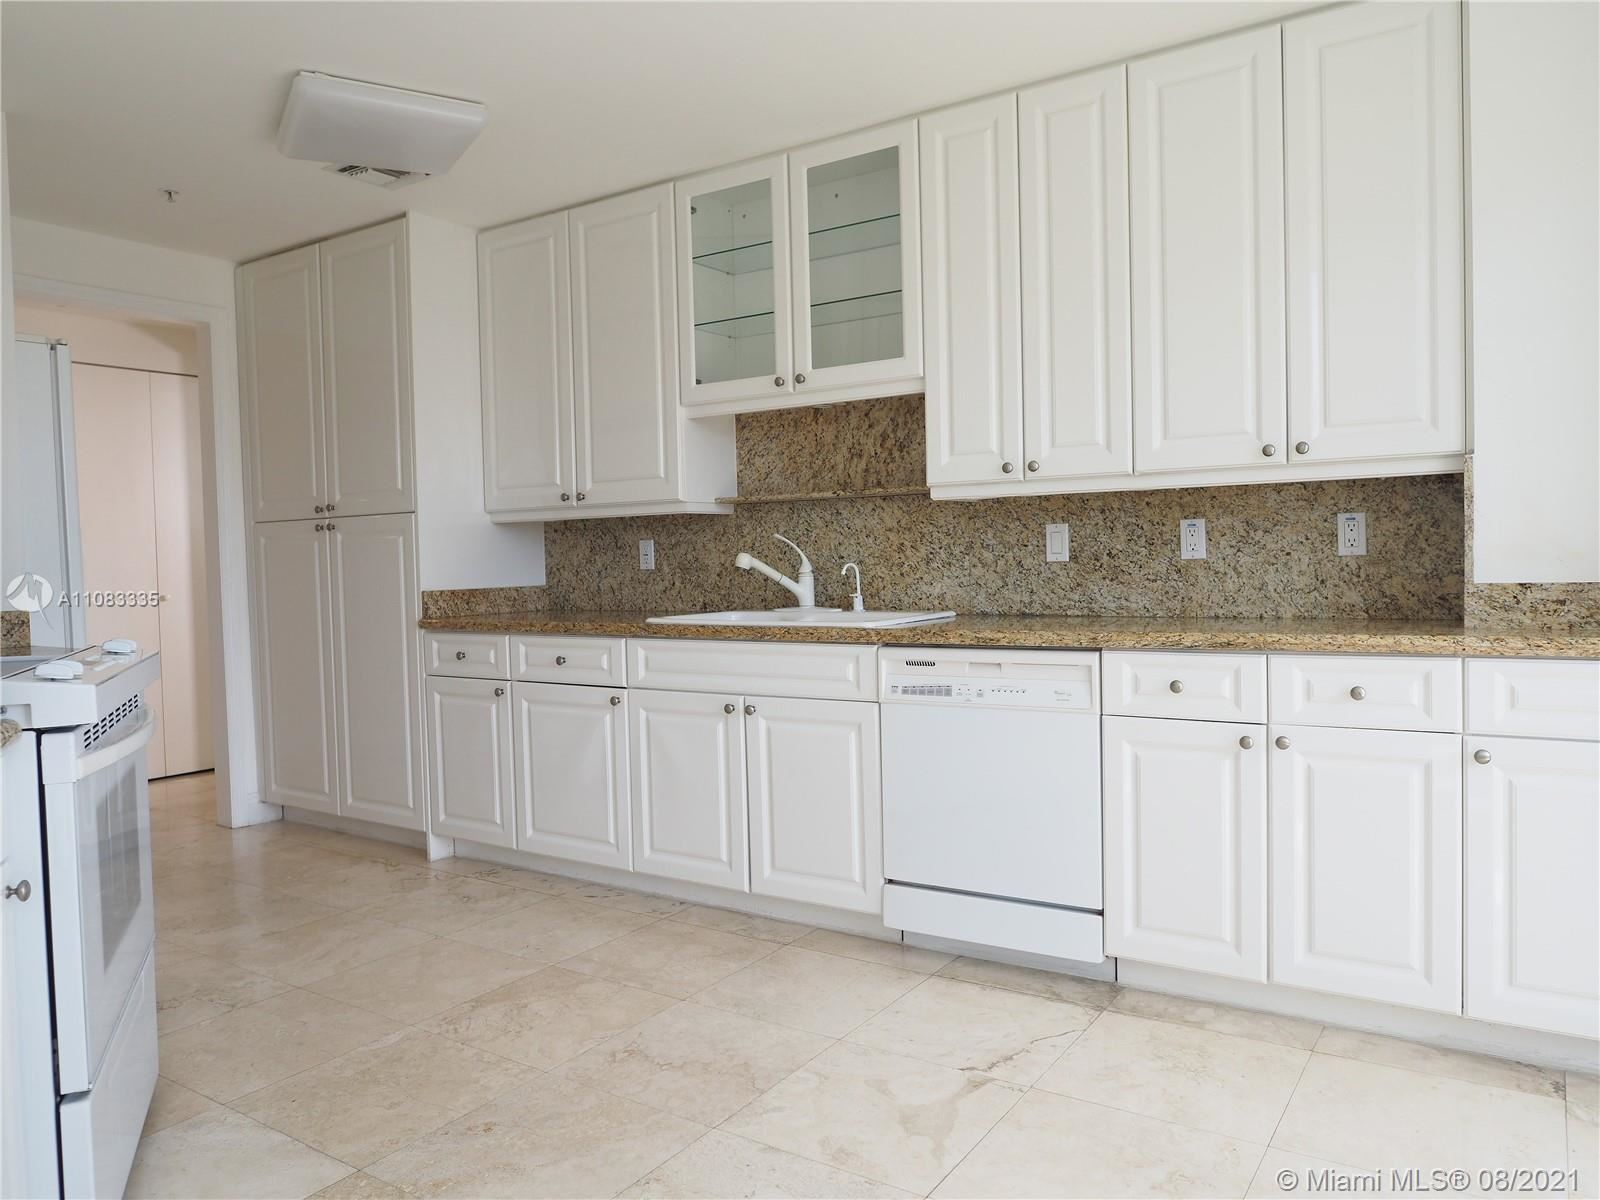 848 Brickell Key Dr #1705, Miami, FL 33131 - #: A11083335